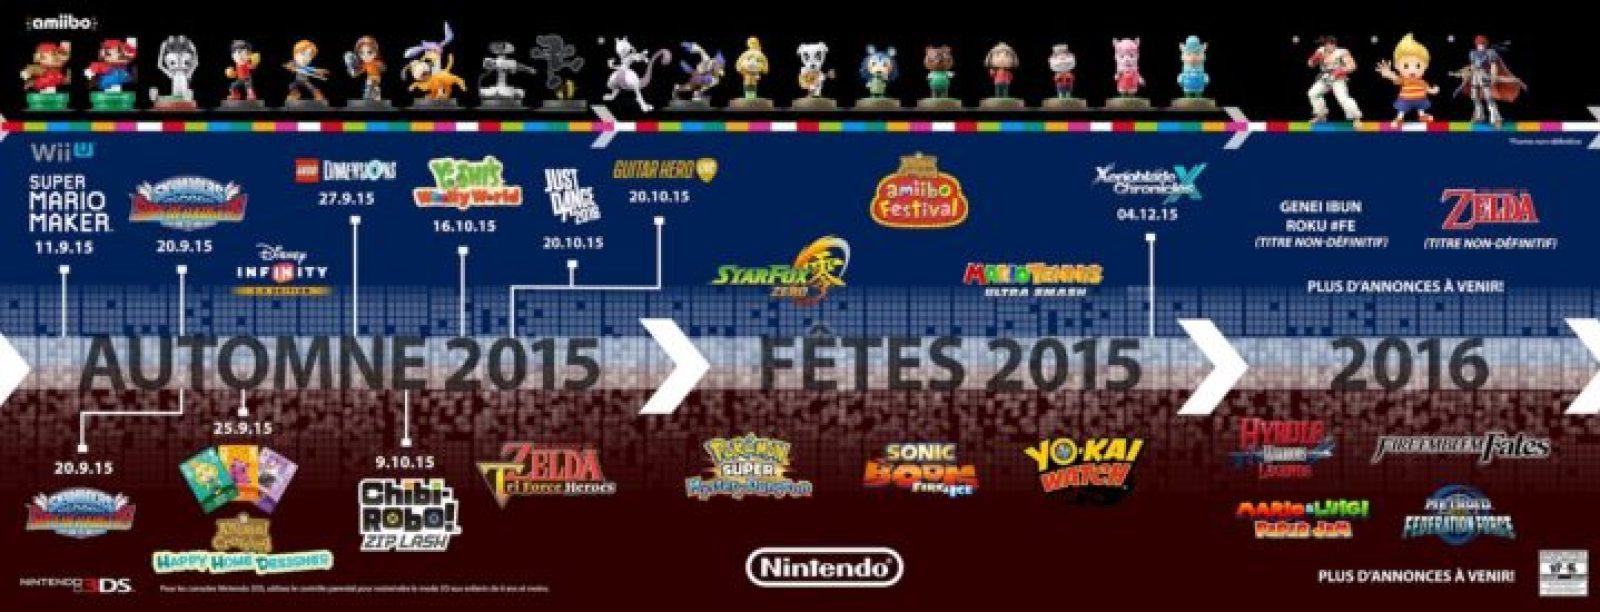 date sortie jeux nintendo wii u 3ds (1)